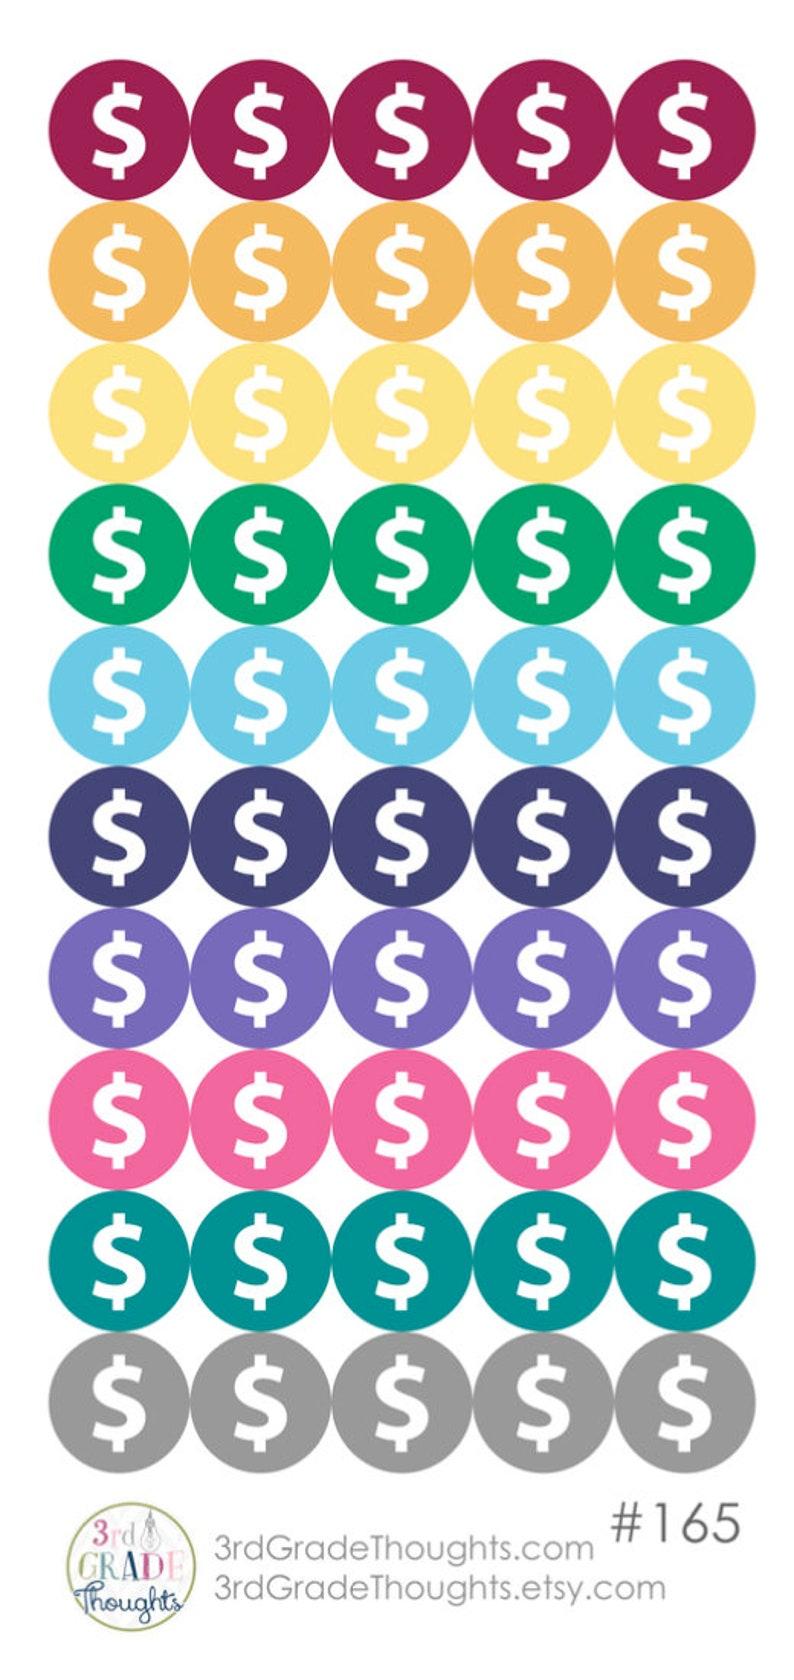 Cash Budget Money Dollar 165 image 0